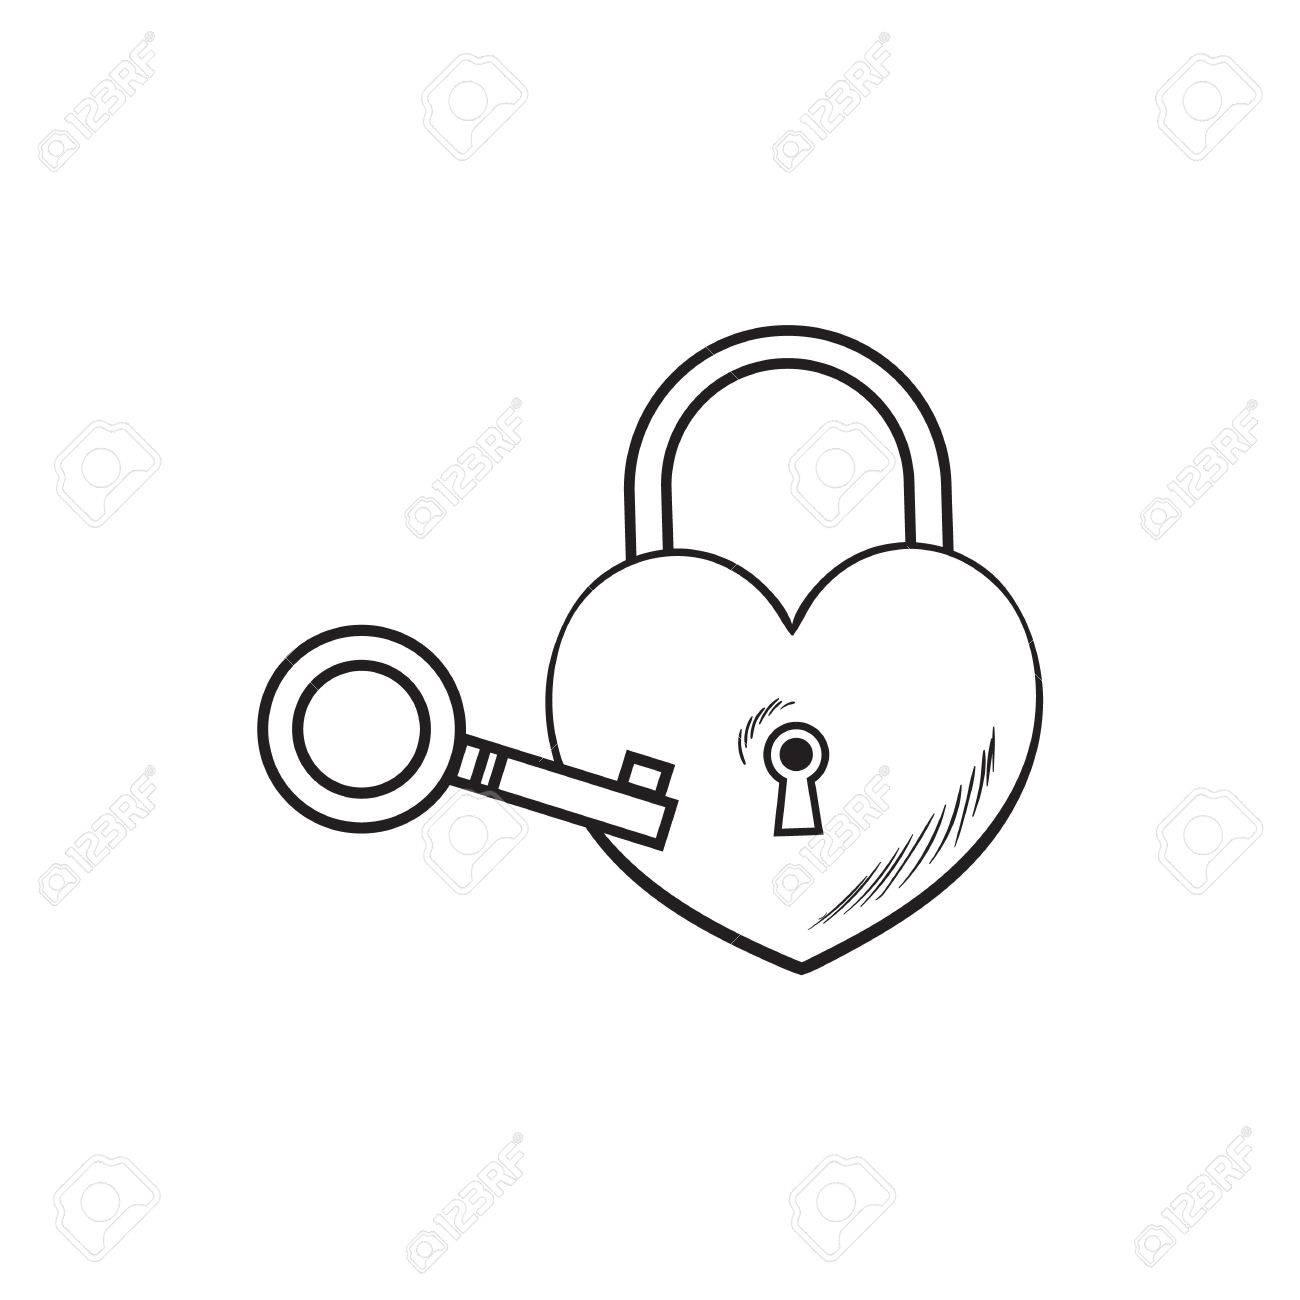 1300x1300 Heart Shaped Padlock And Key For Love Lock Unity Ceremony, Sketch